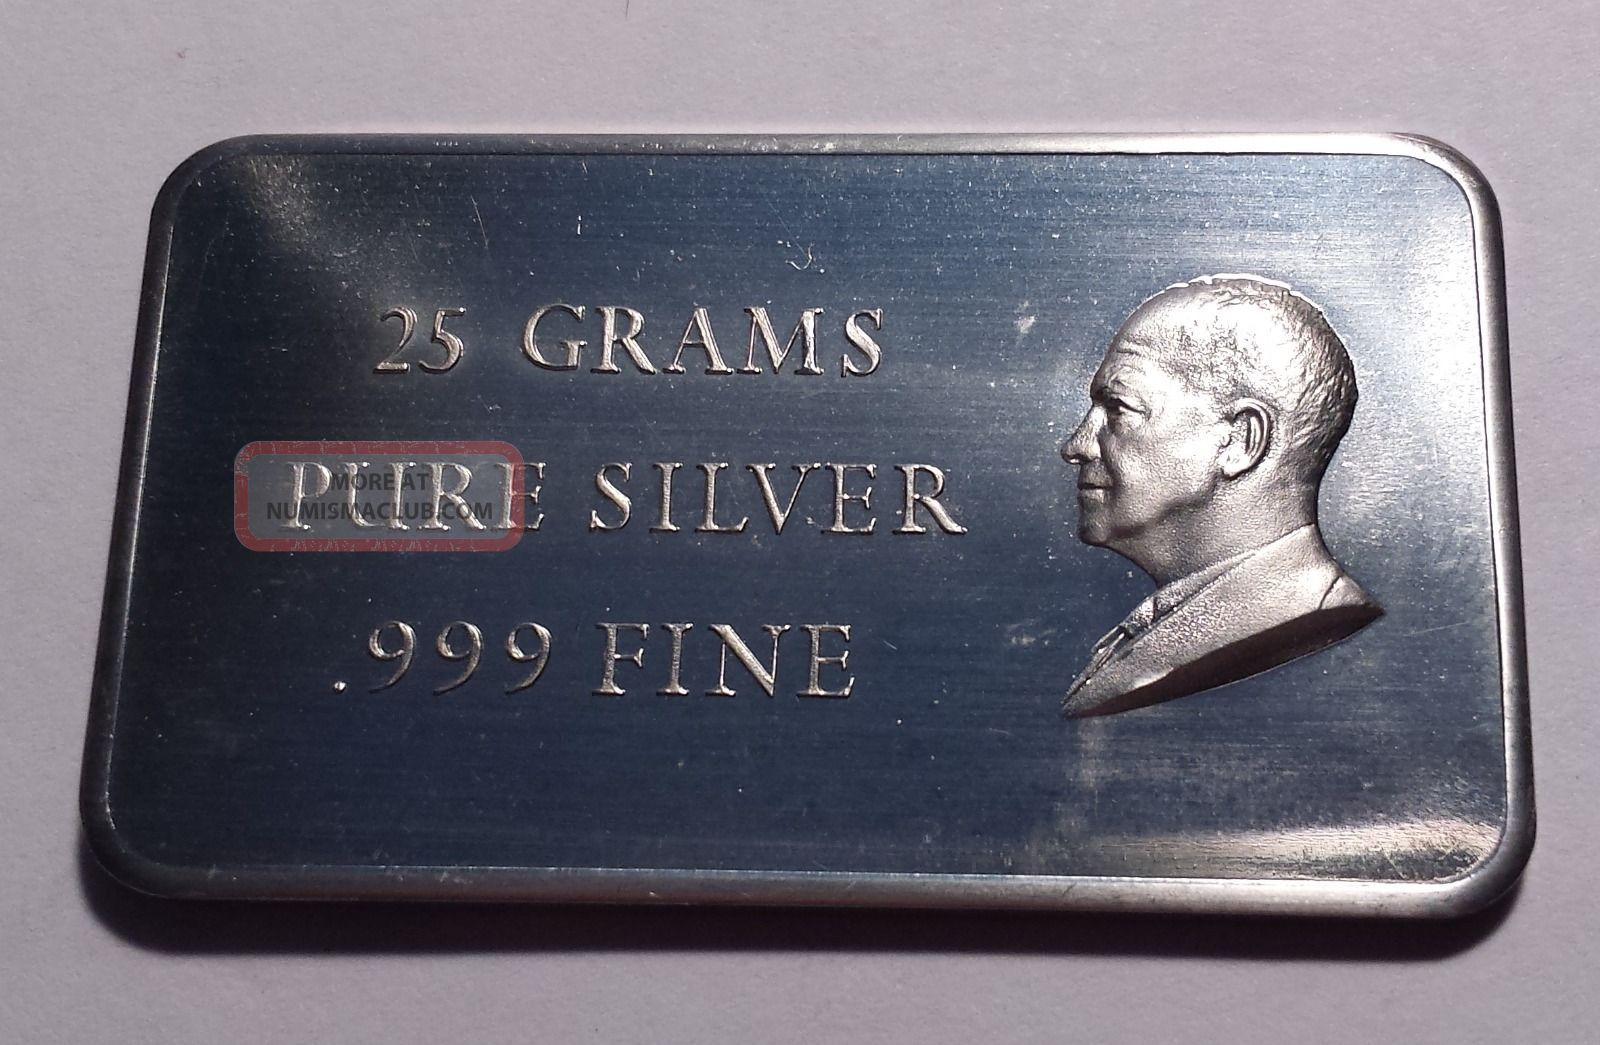 25 Grams Pure Silver 999 Fine Eisenhower Silver Bar 25g